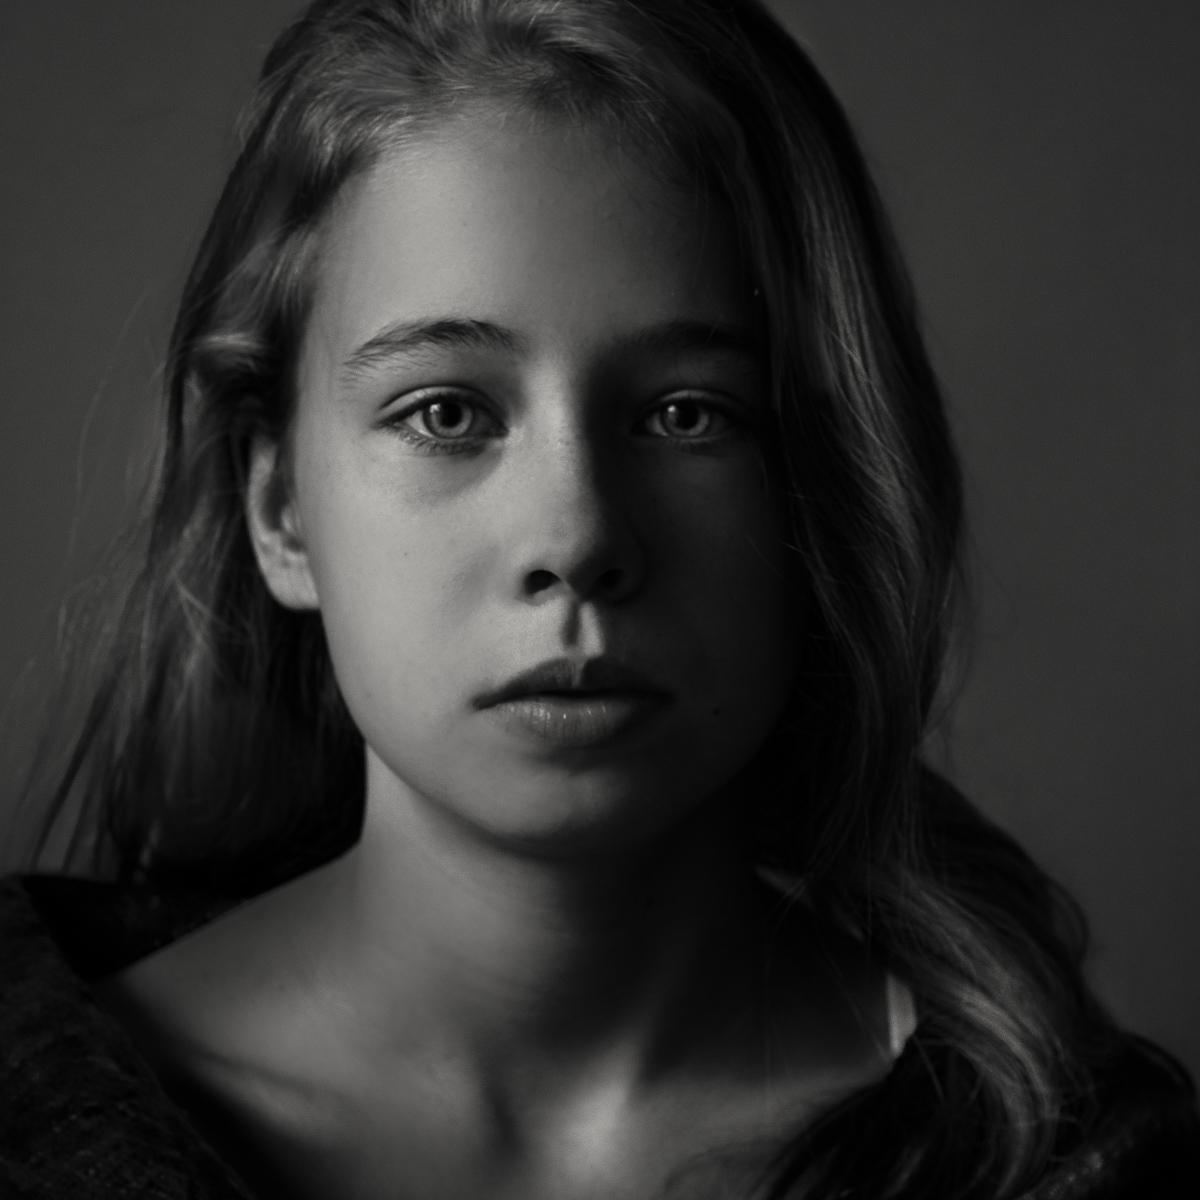 Week 49, Gabrielle van den Elshout